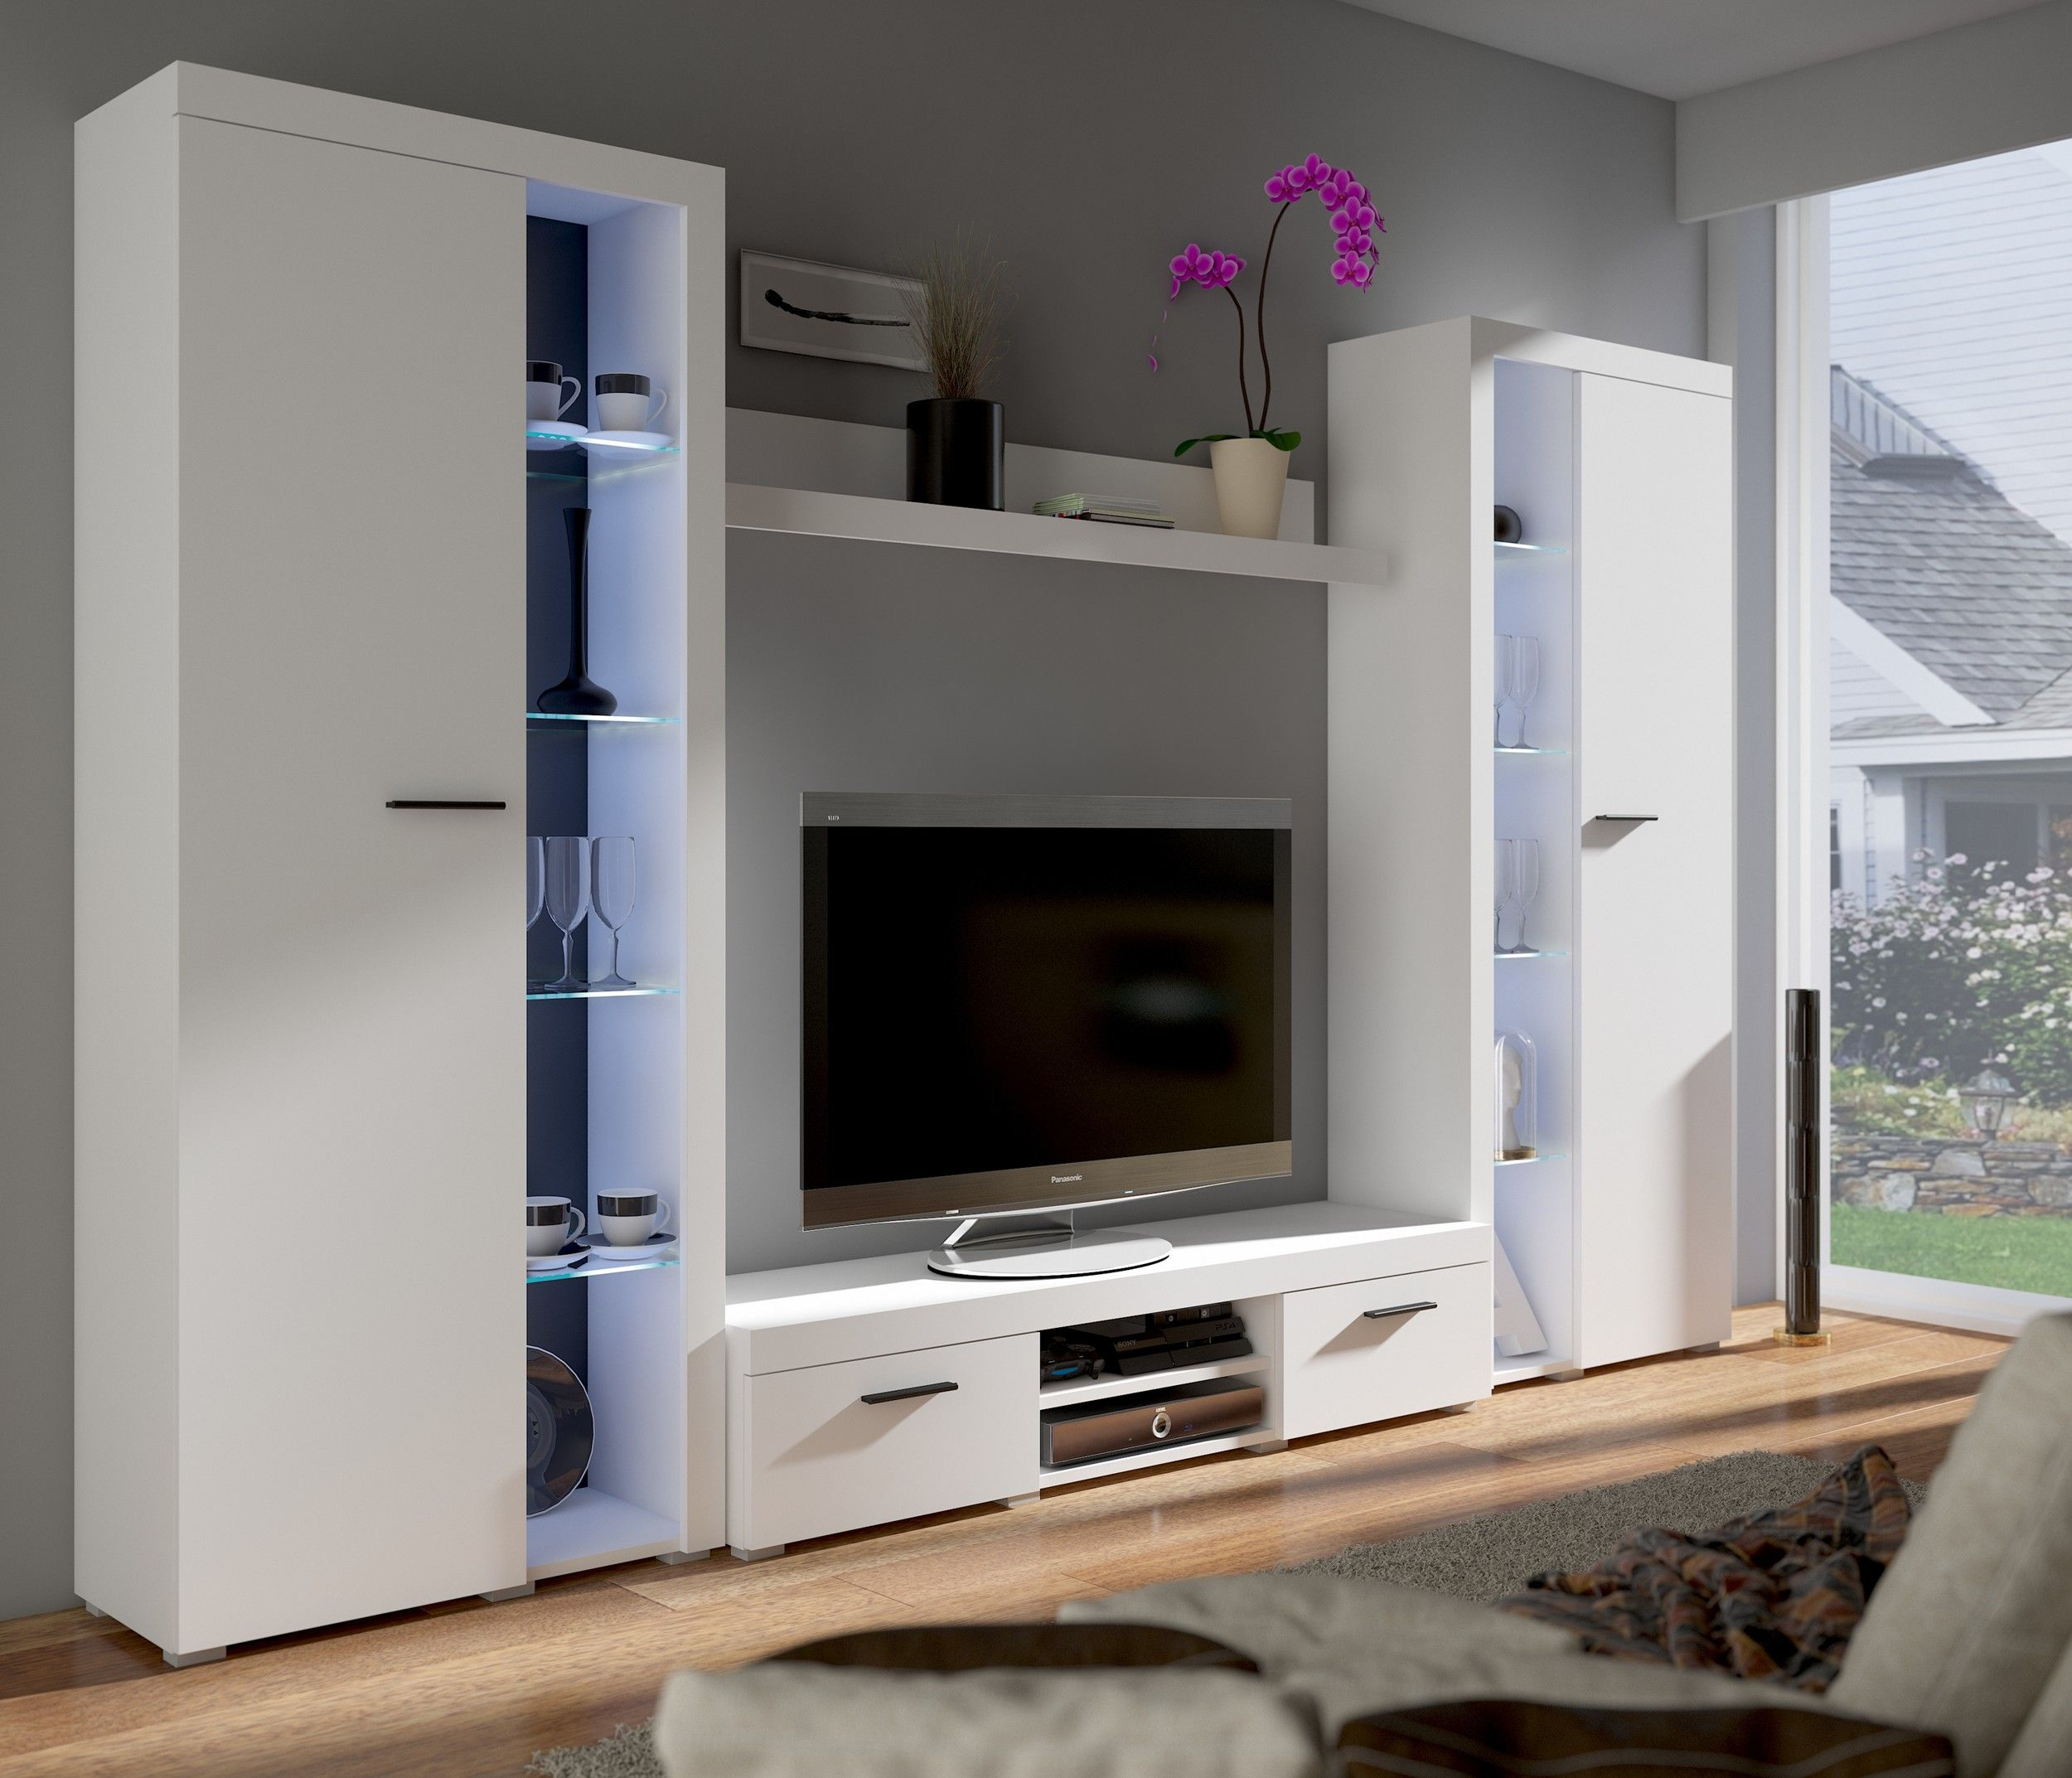 top wohnwand rumba xl anbauwand wohnkombi wohnzimmer weiss. Black Bedroom Furniture Sets. Home Design Ideas